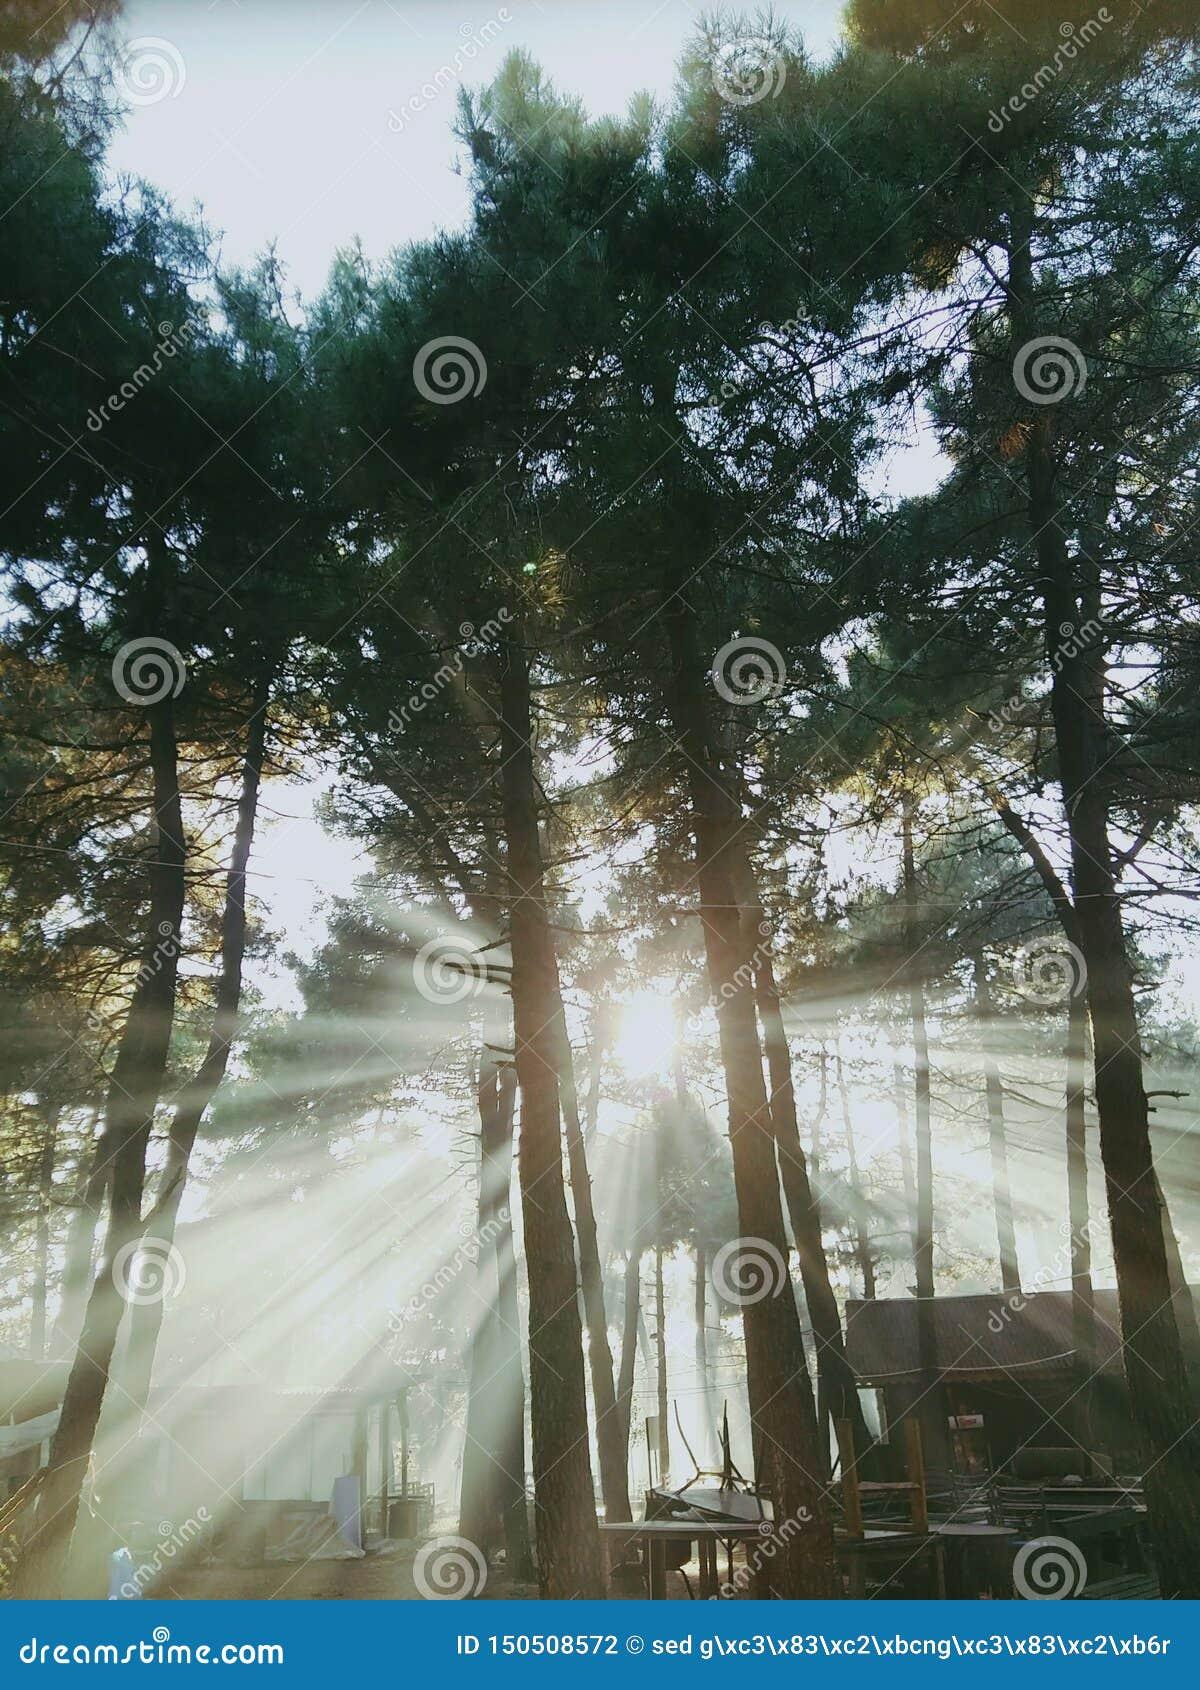 Directed Sunrays Through Woods